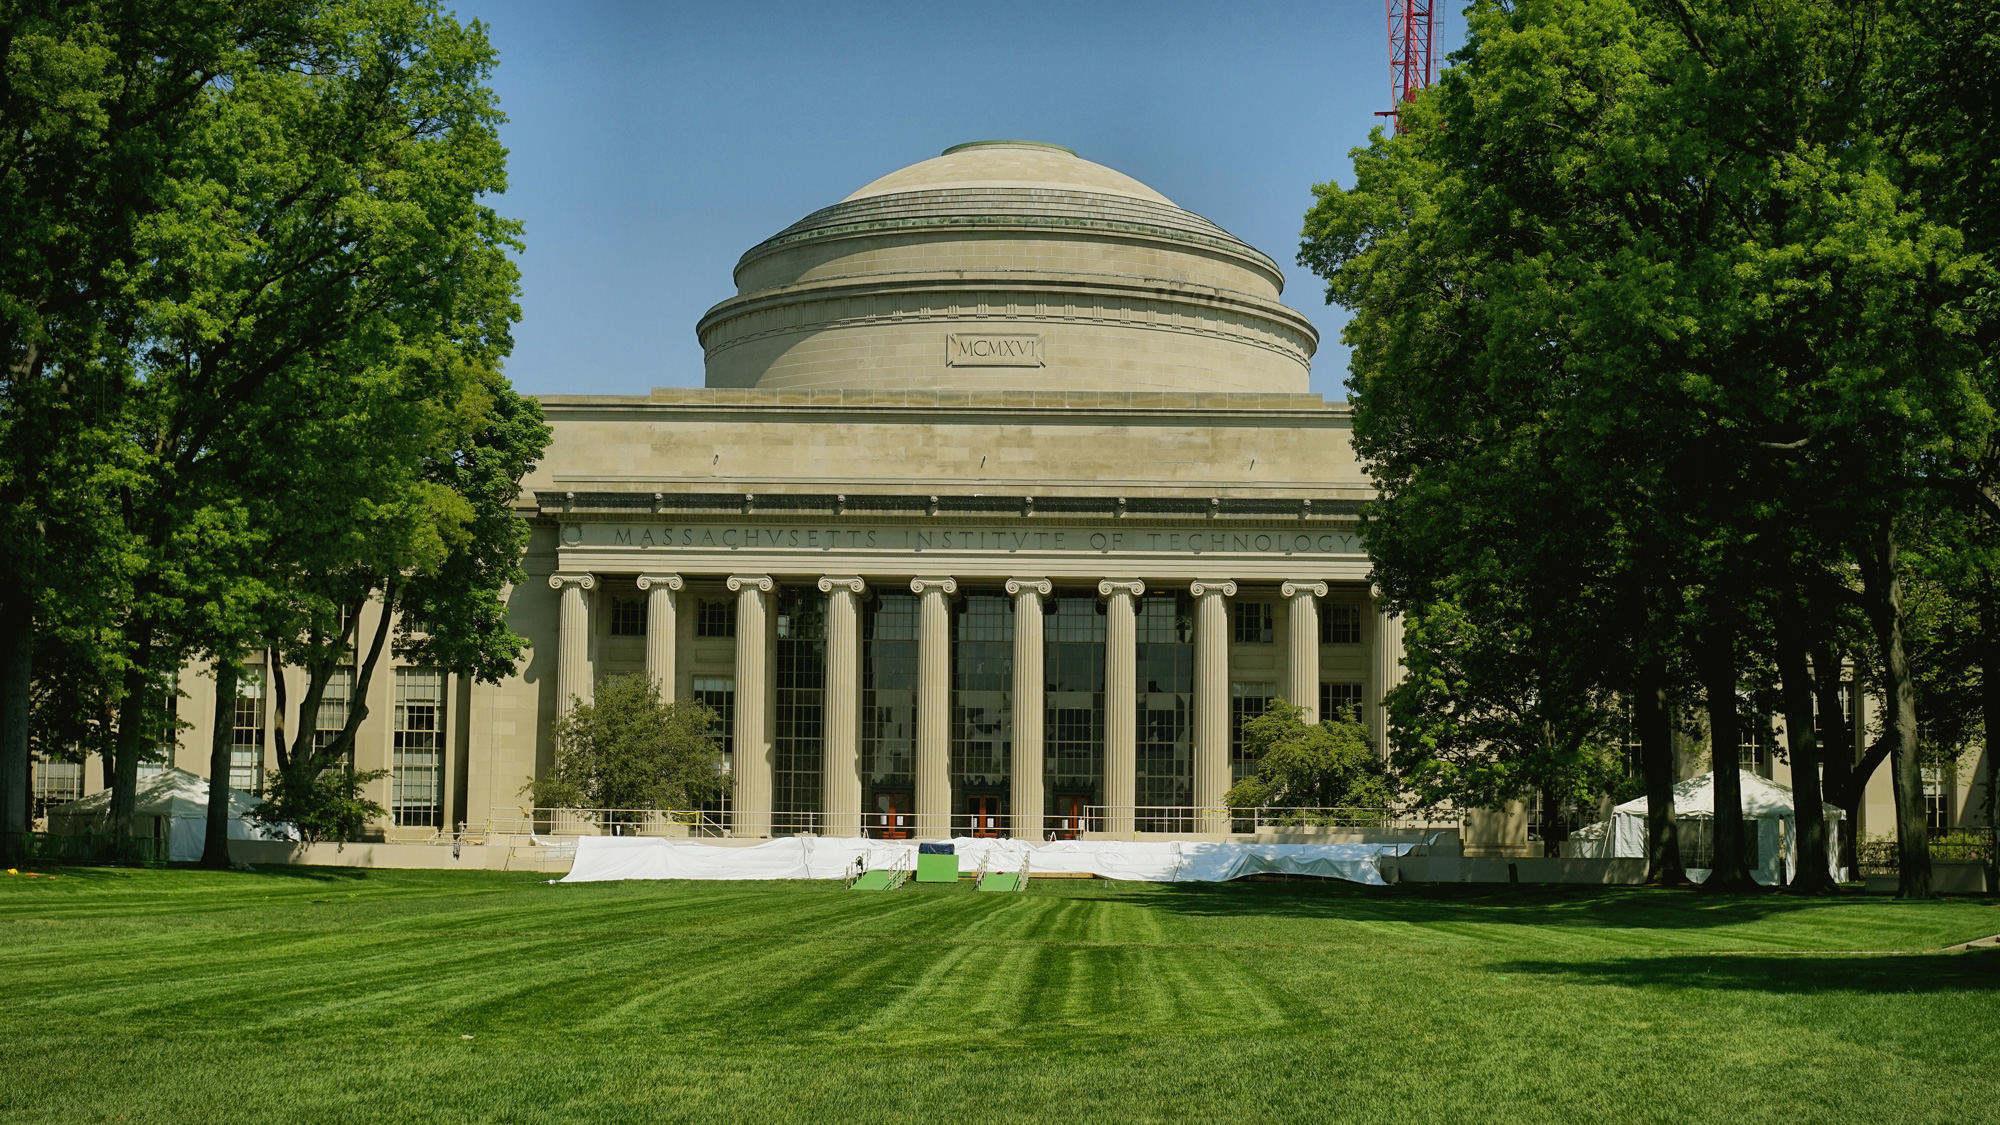 Killian Court(基连大草坪)是举行重大活动的地方。麦克劳伦大圆顶(Maclaurin Building and Great Dome)是麻省理工学院最具历史和代表性的一栋建筑,是麻省理工学院的象征。